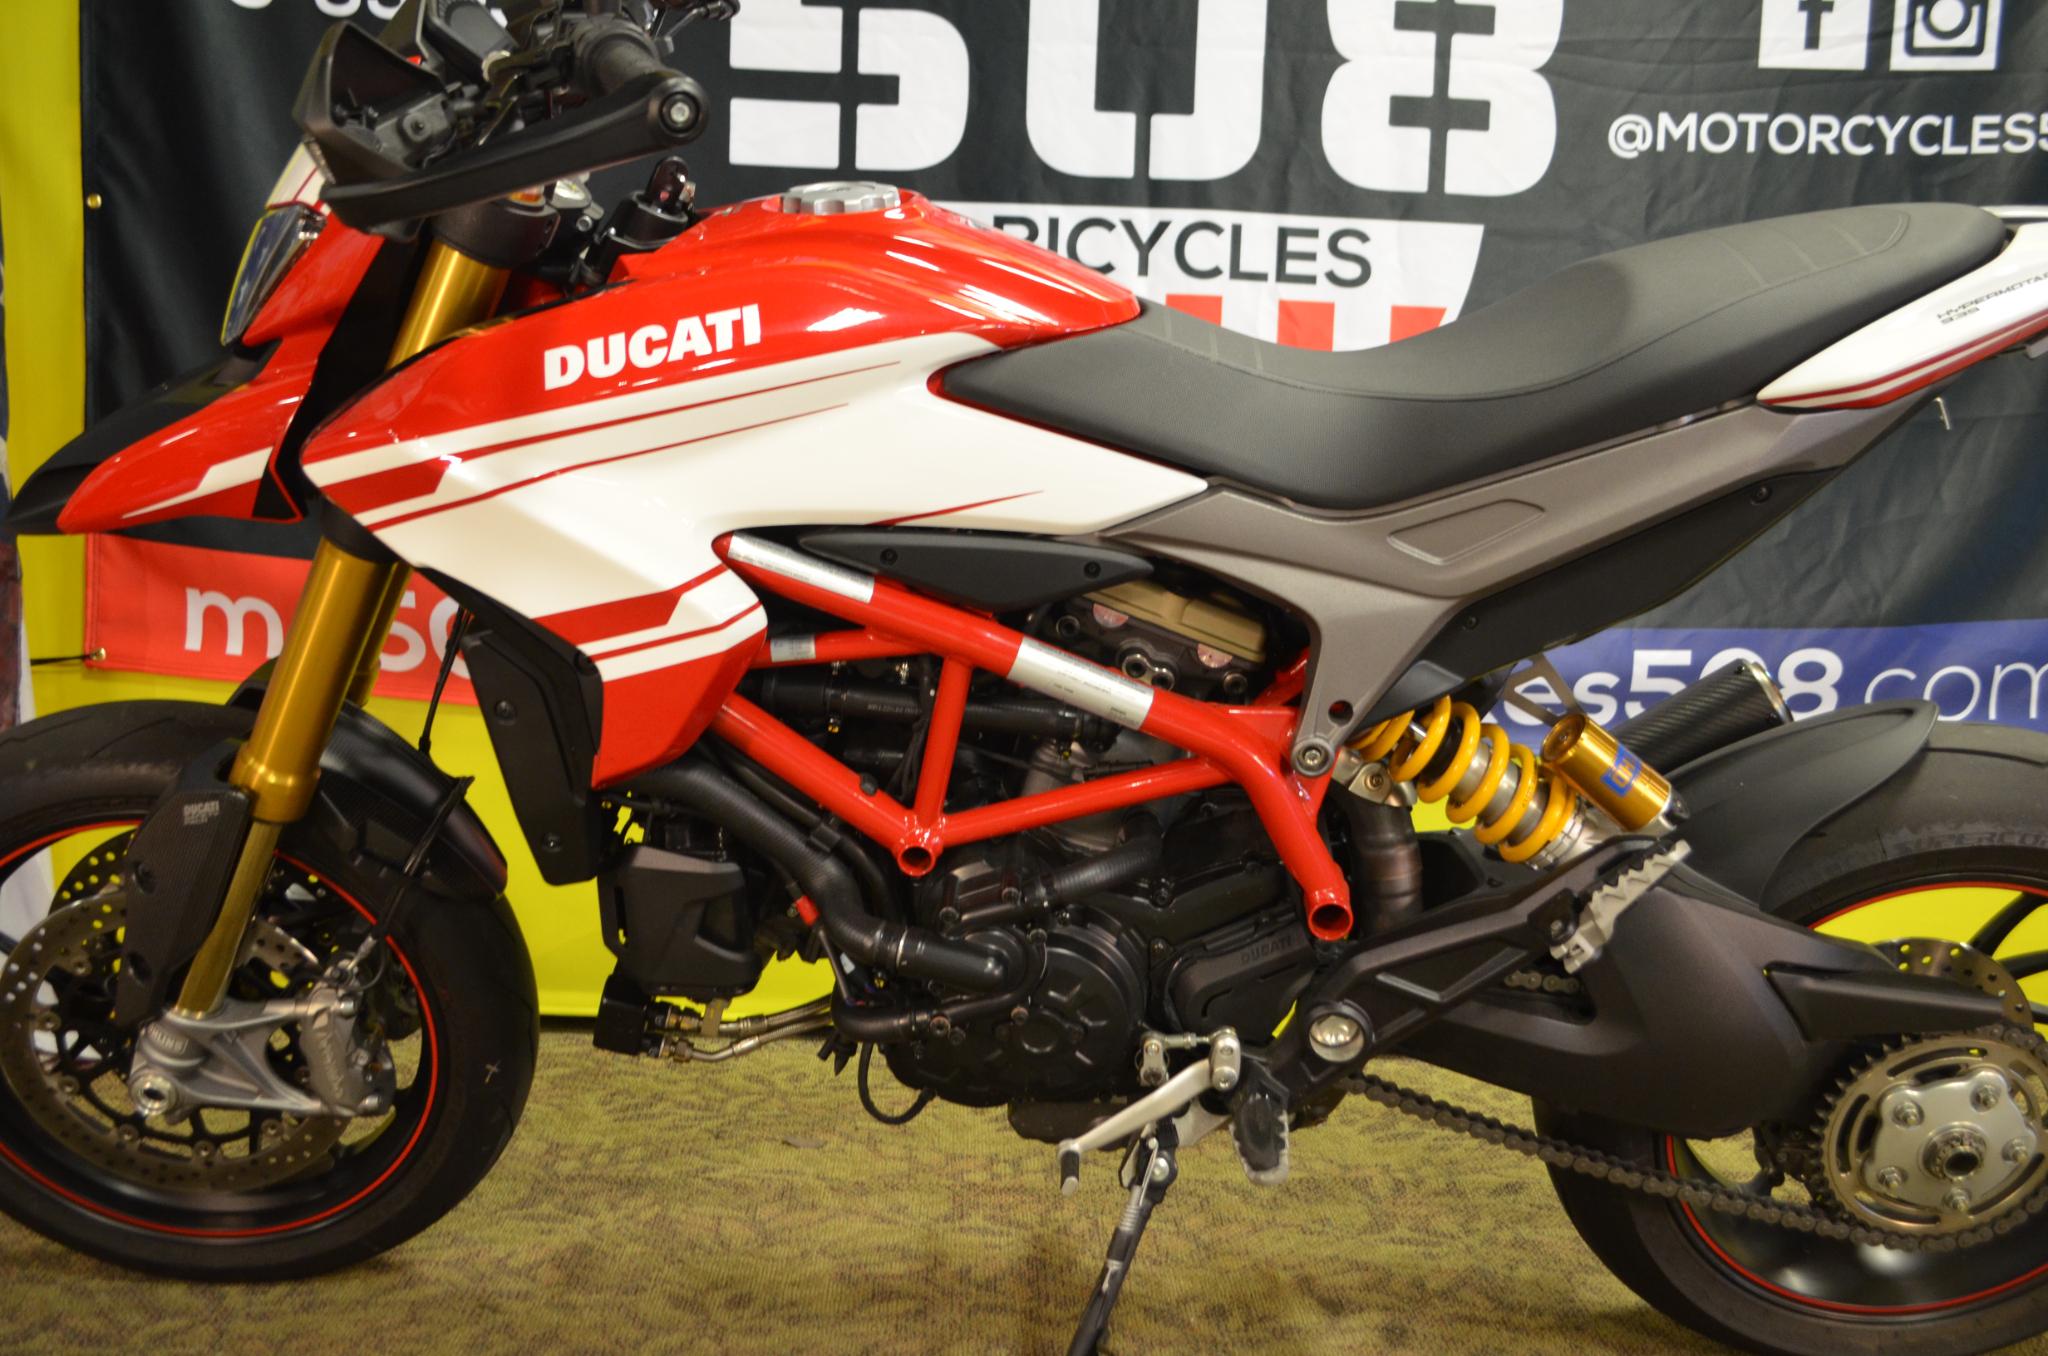 2018 Ducati Hypermotard 939 SP